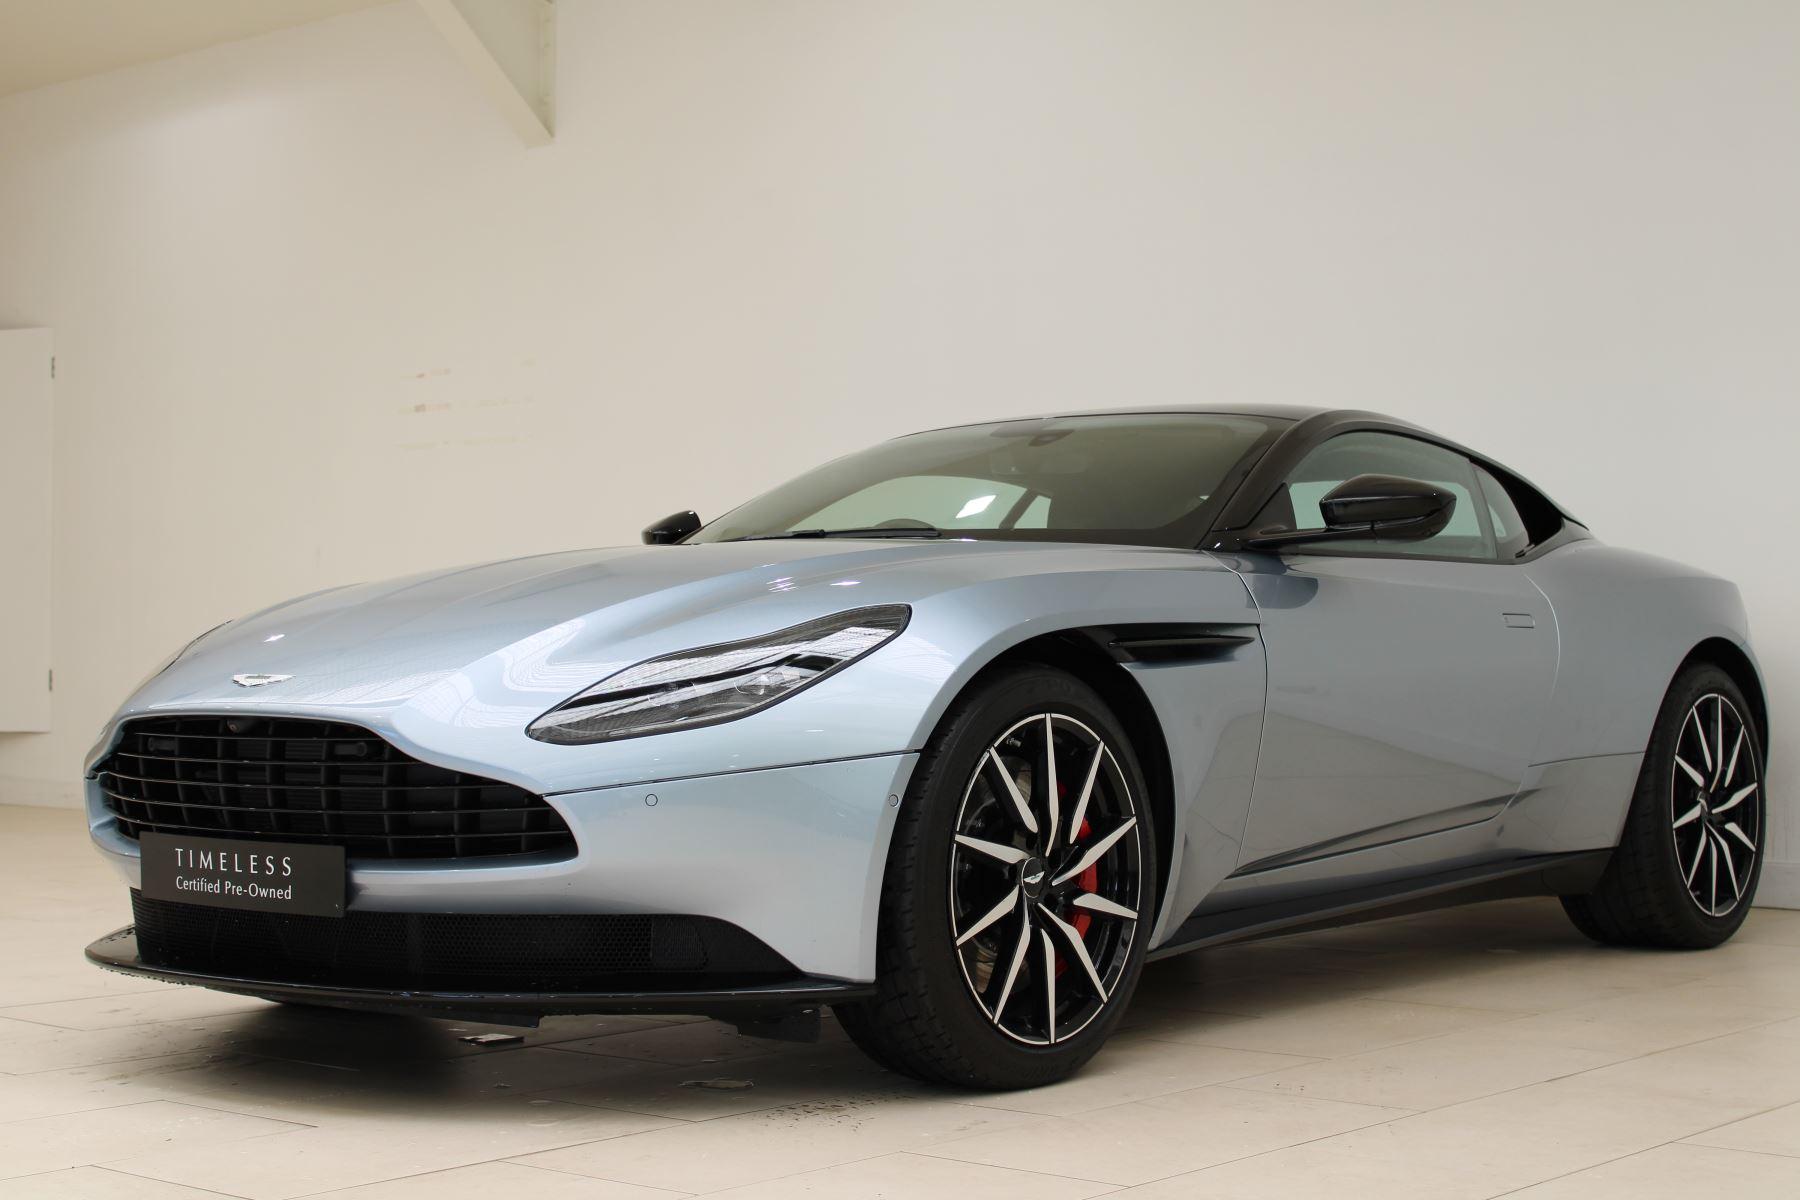 Aston Martin DB11 V8 2dr Touchtronic Auto image 5